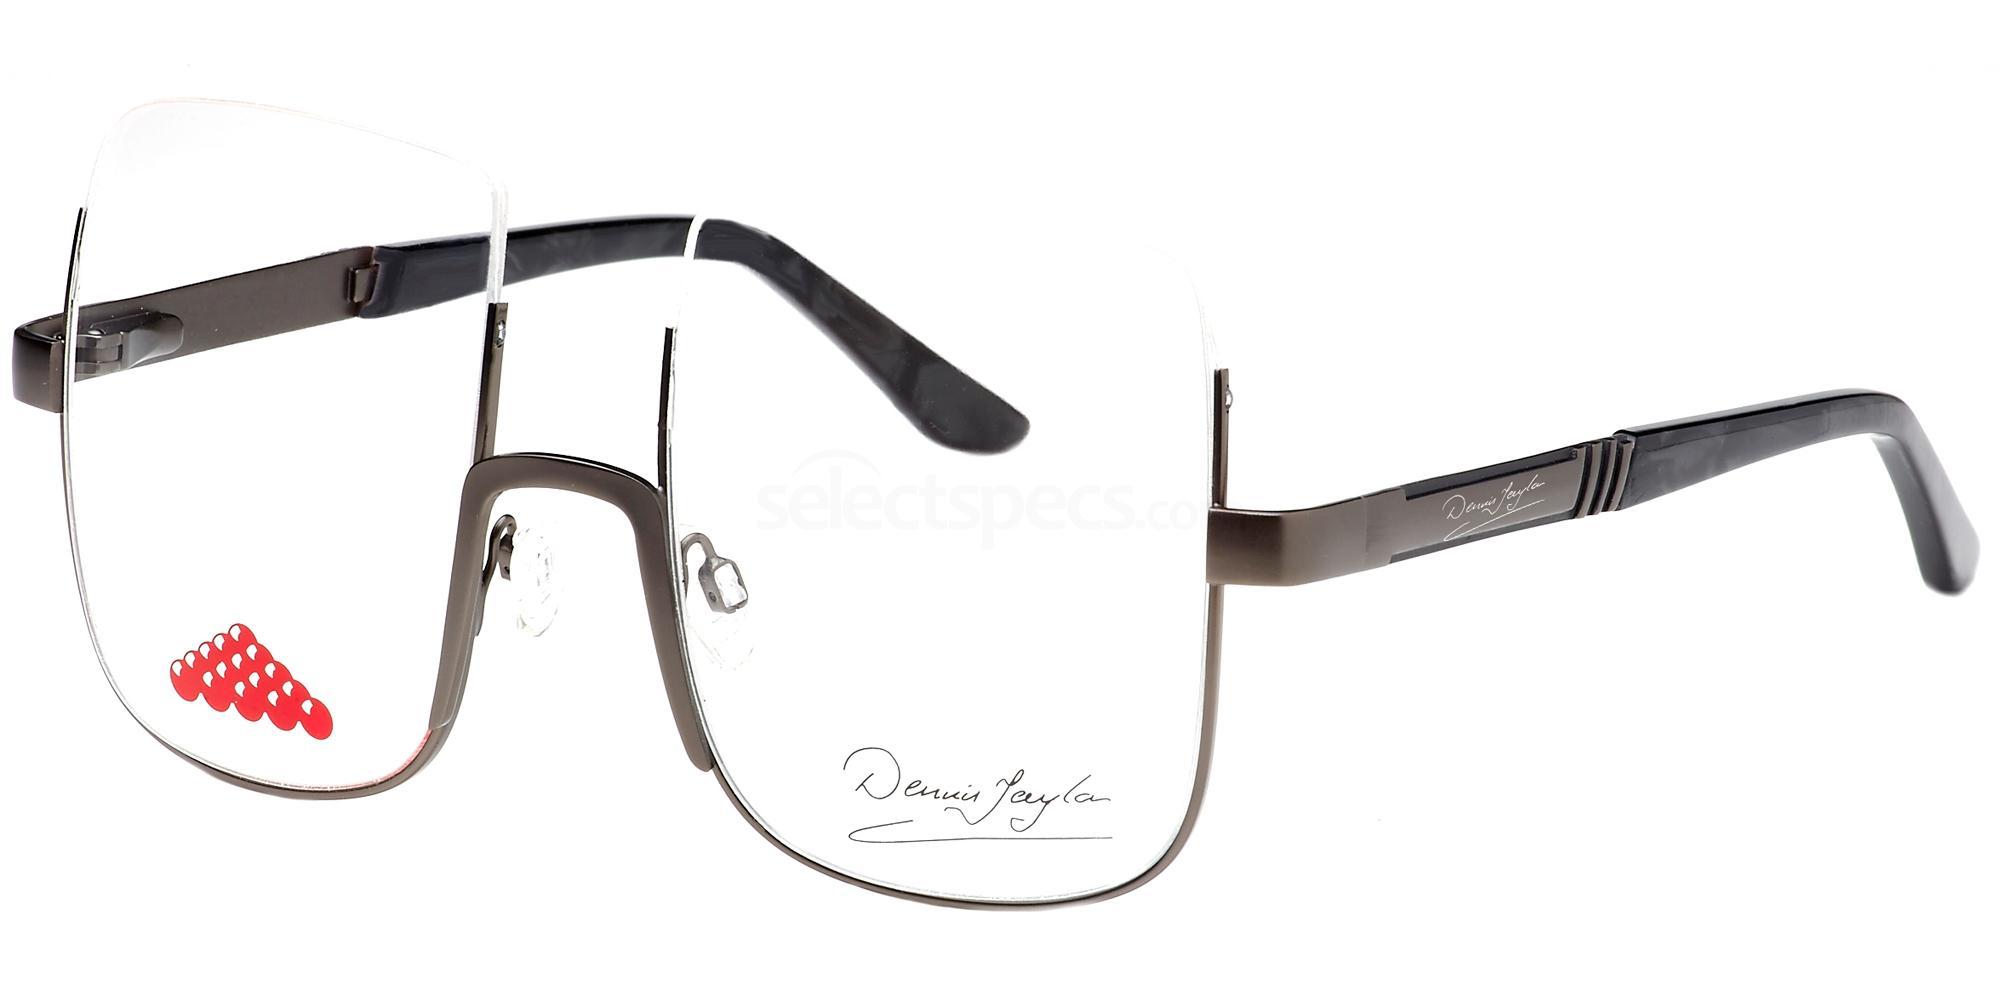 C1 DTSN02 - Pro-Snooker Glasses Glasses, Dennis Taylor